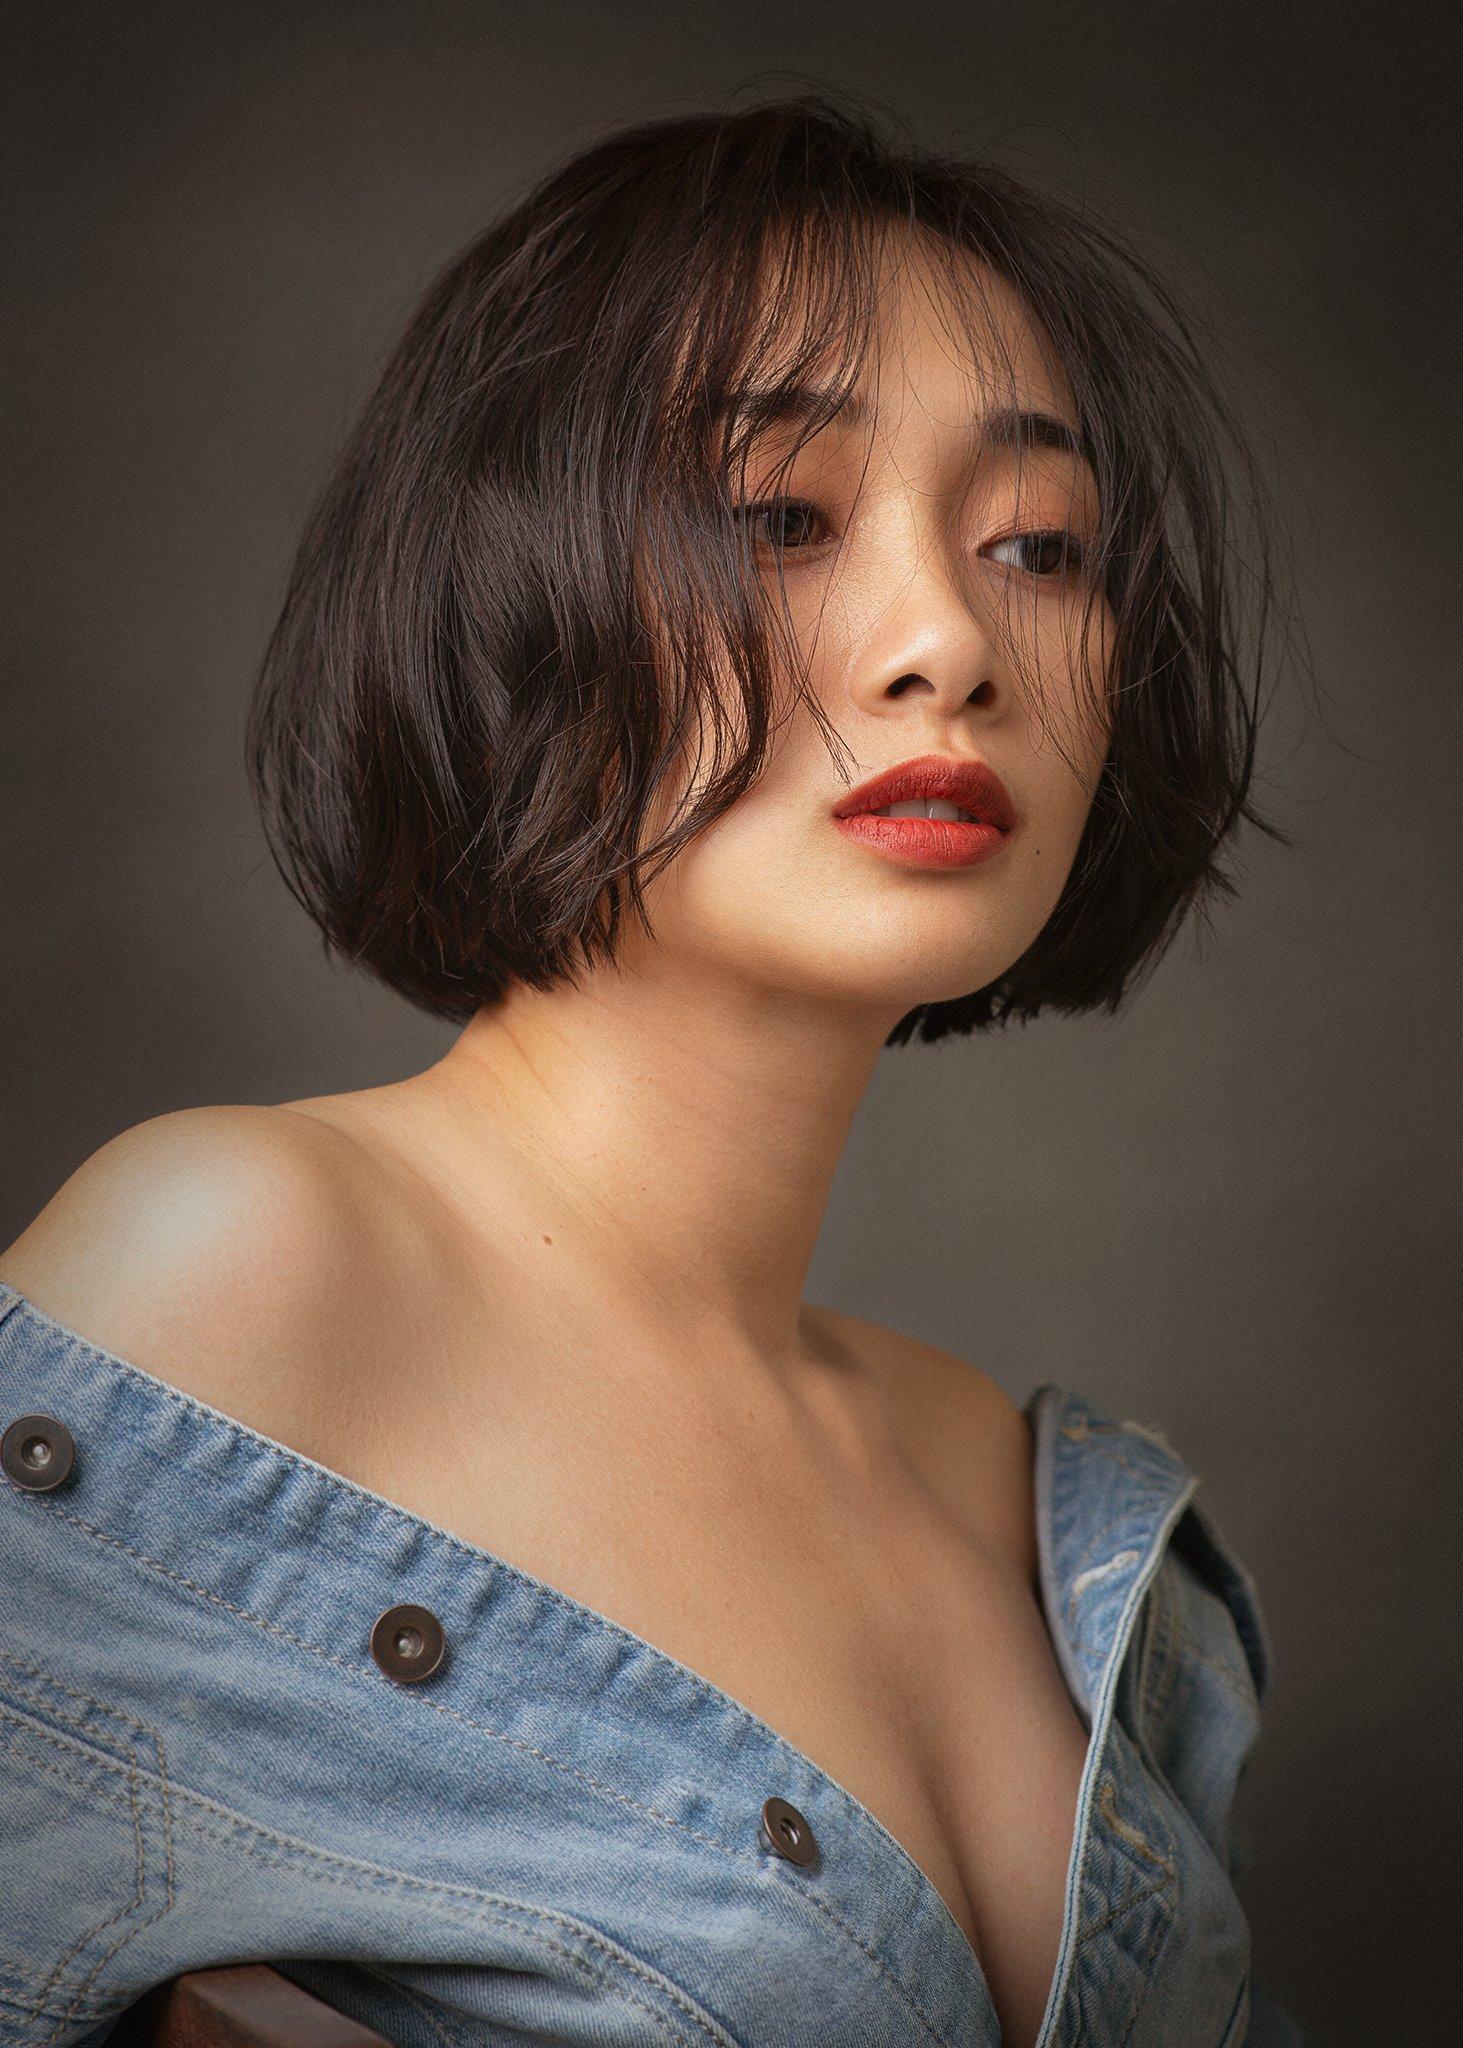 portrait, female, woman, girl, asian, vietnam, vietnamese, young, face, beauty, glamour, studio, eyes, short hair, hairstyle, Hoang Viet Nguyen